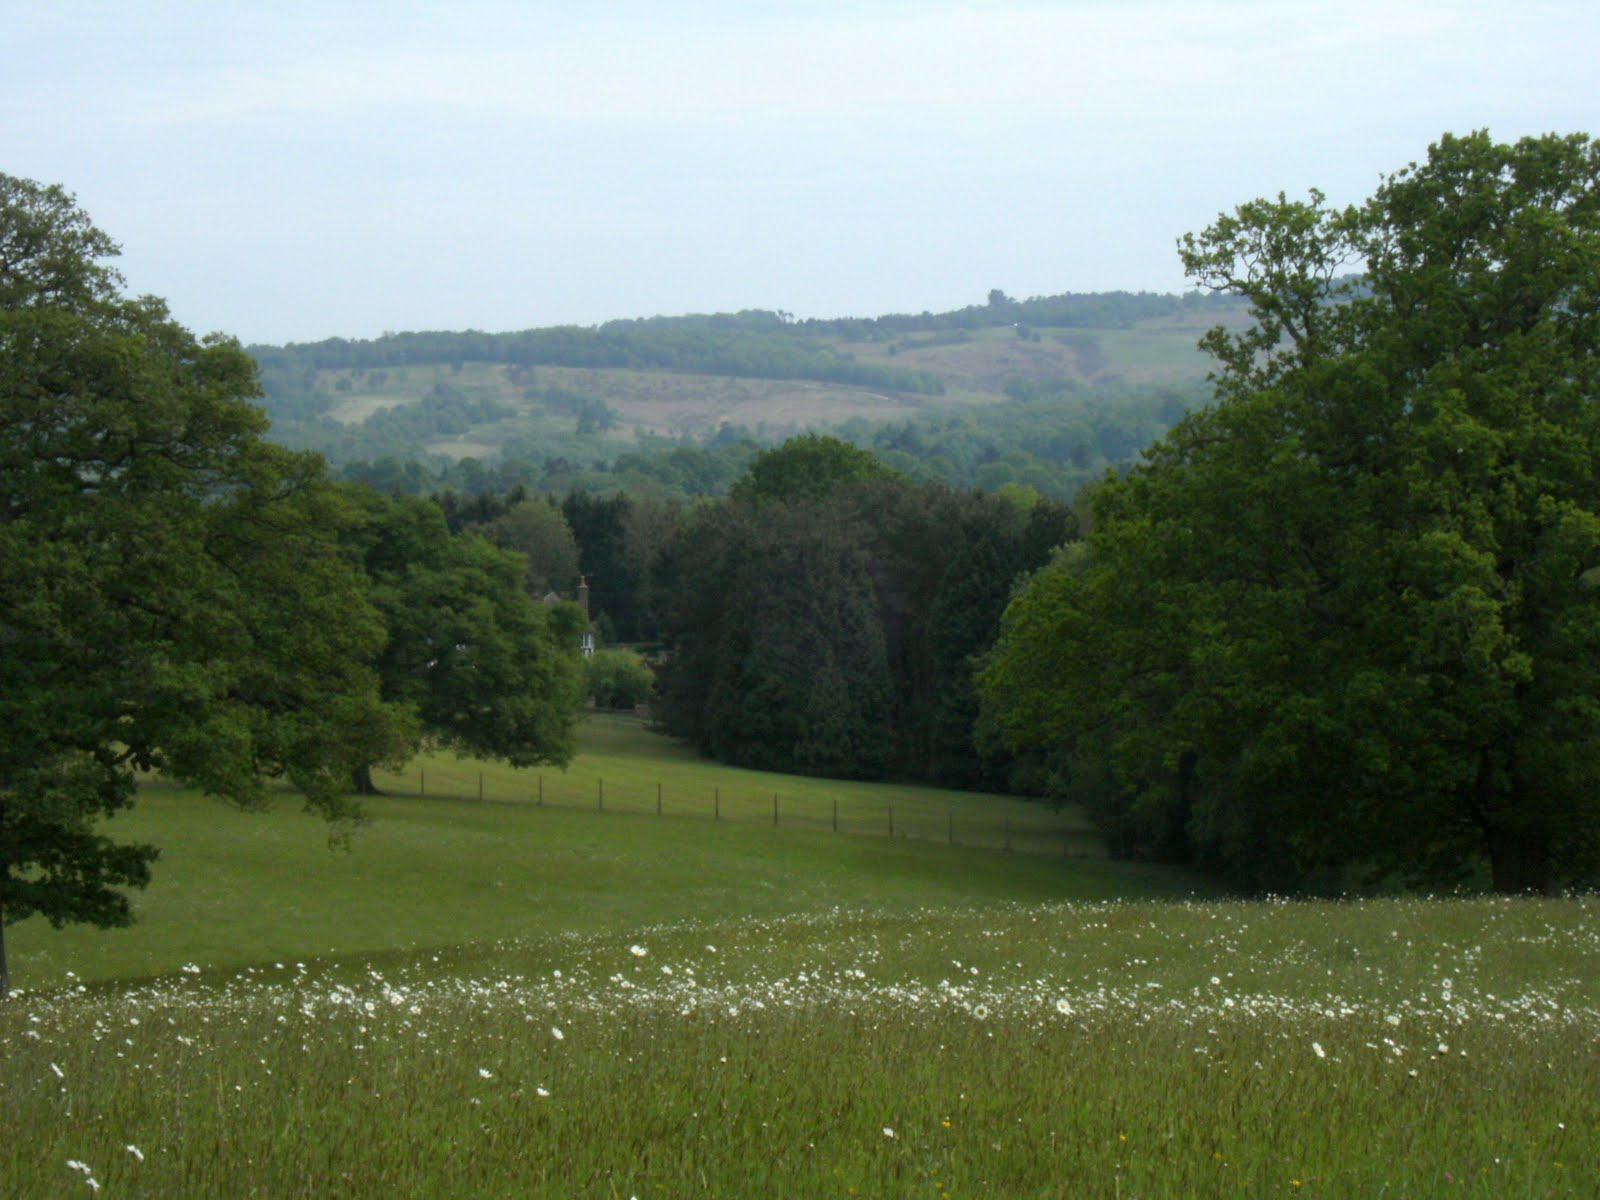 DSCF7818 Distant view of Ashdown Forest